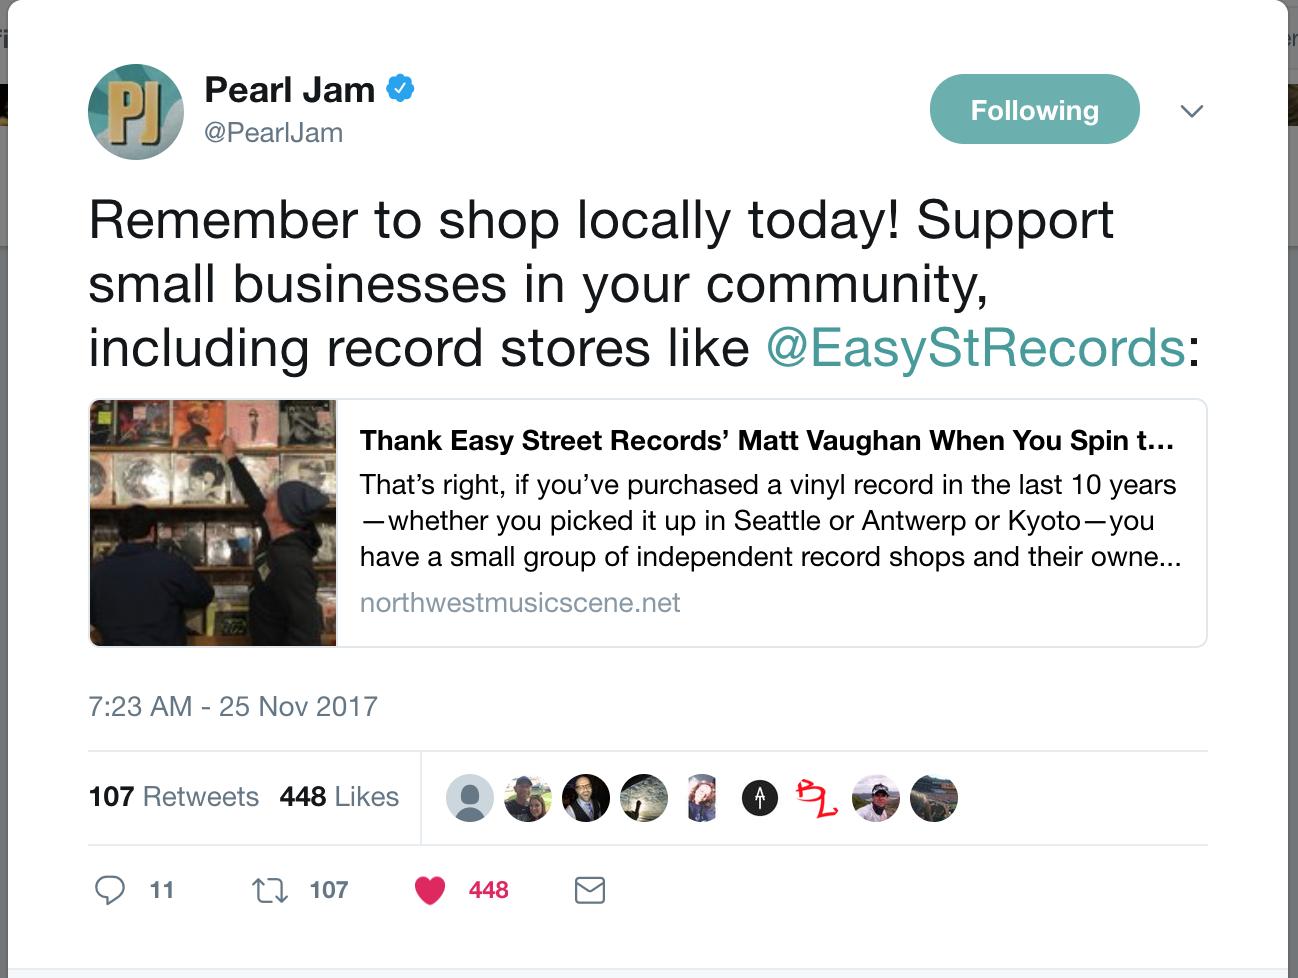 Pearl Jam Tweets the Story